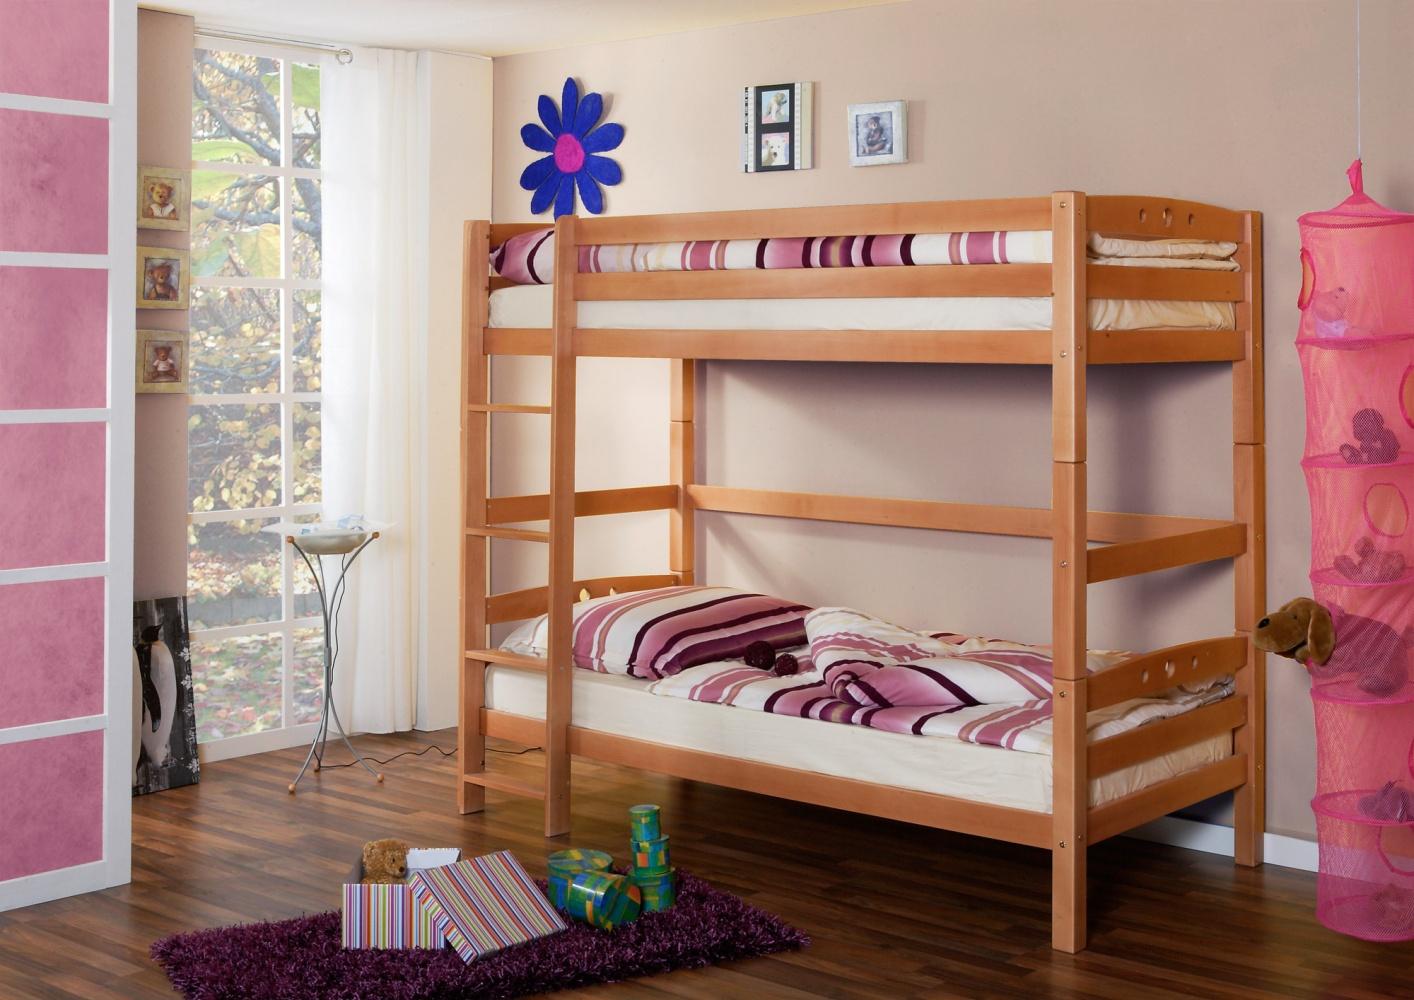 Etagenbett Buche Extra : Etagenbett extra hoch oskar buche massiv kaufen bei möbel lux